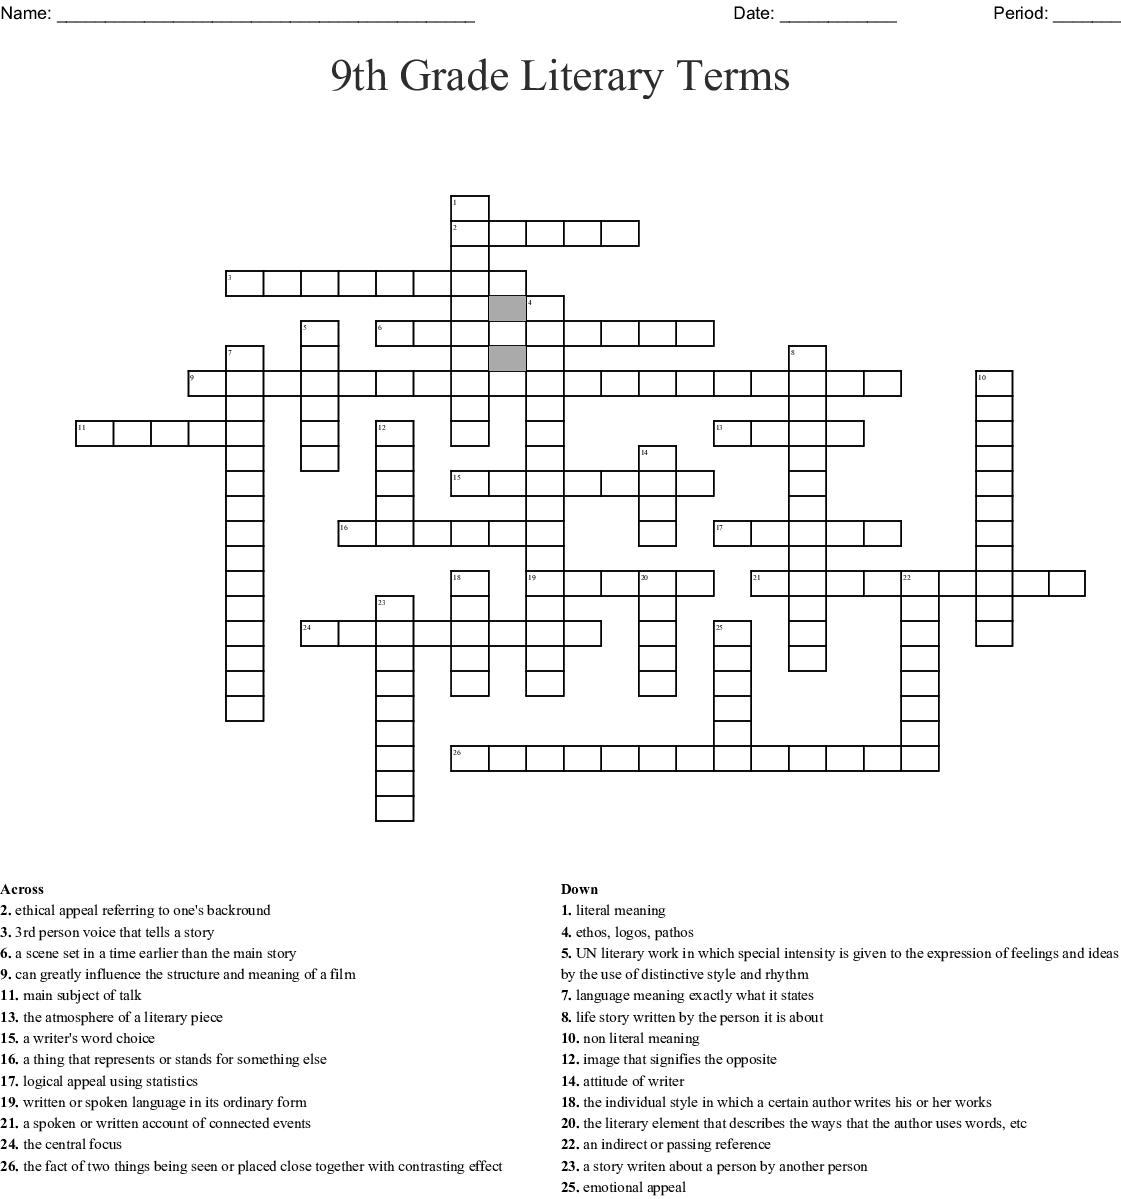 9th Grade Literary Terms Crossword